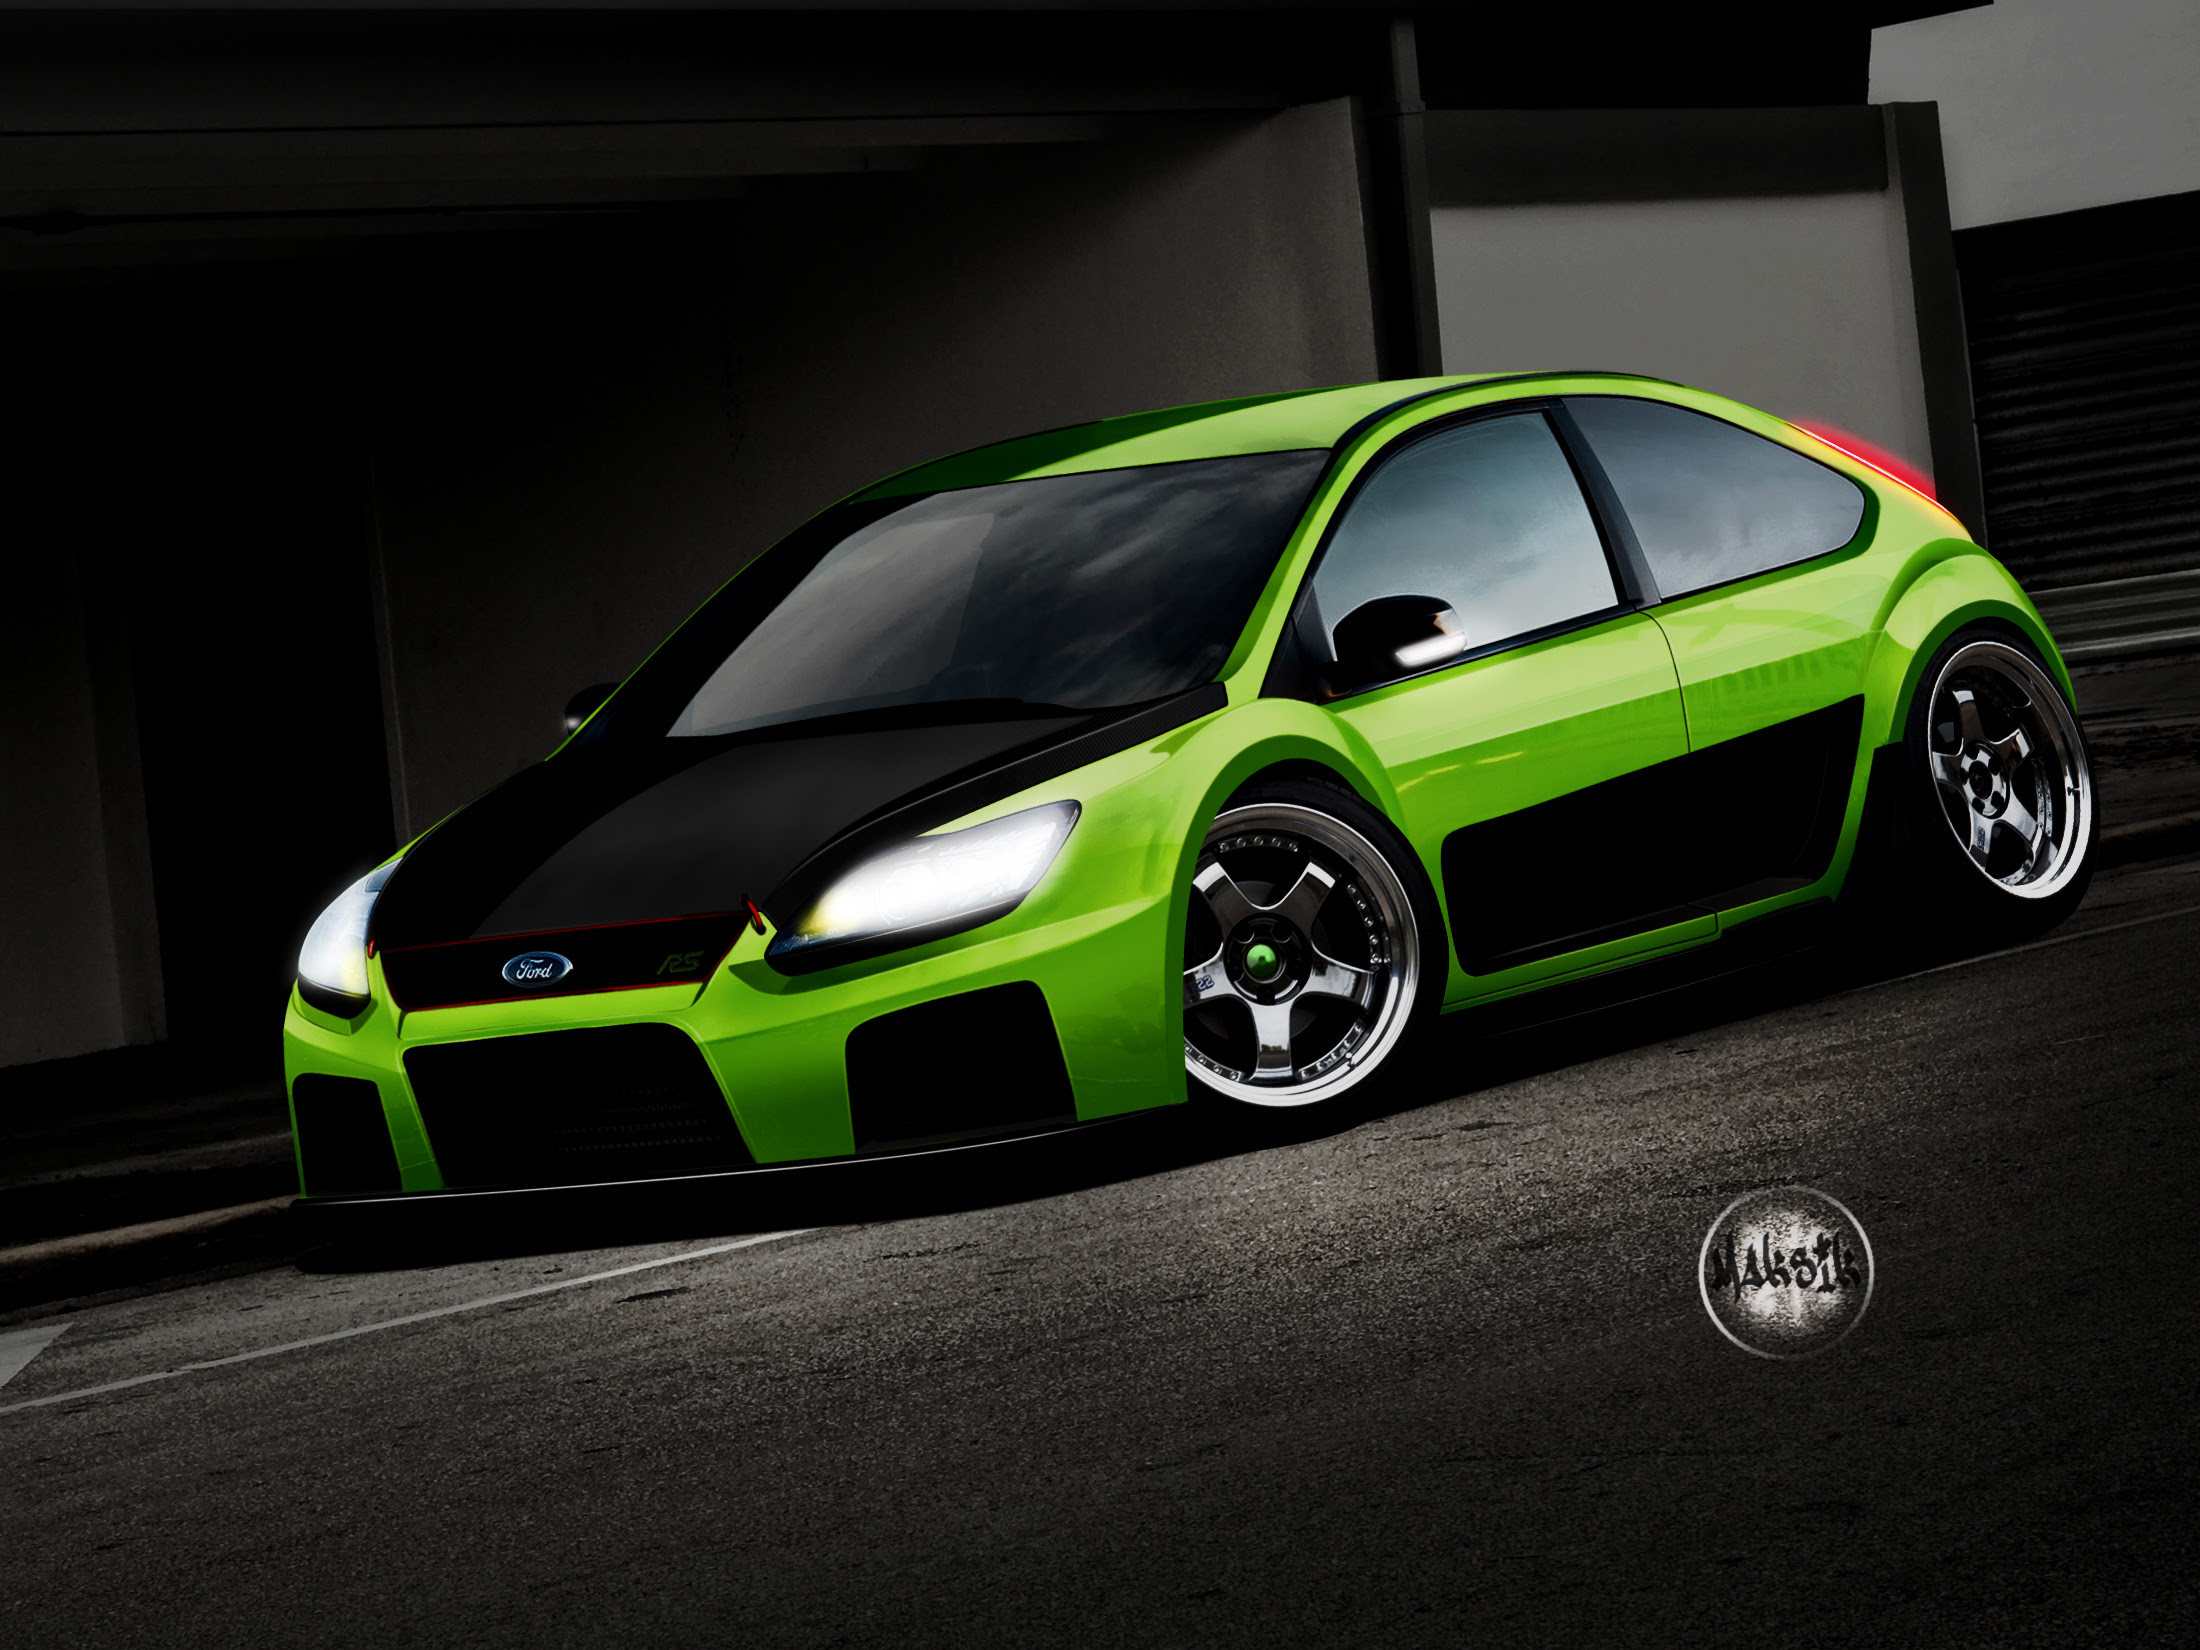 Maks's Profile › Autemo.com › Automotive Design Studio